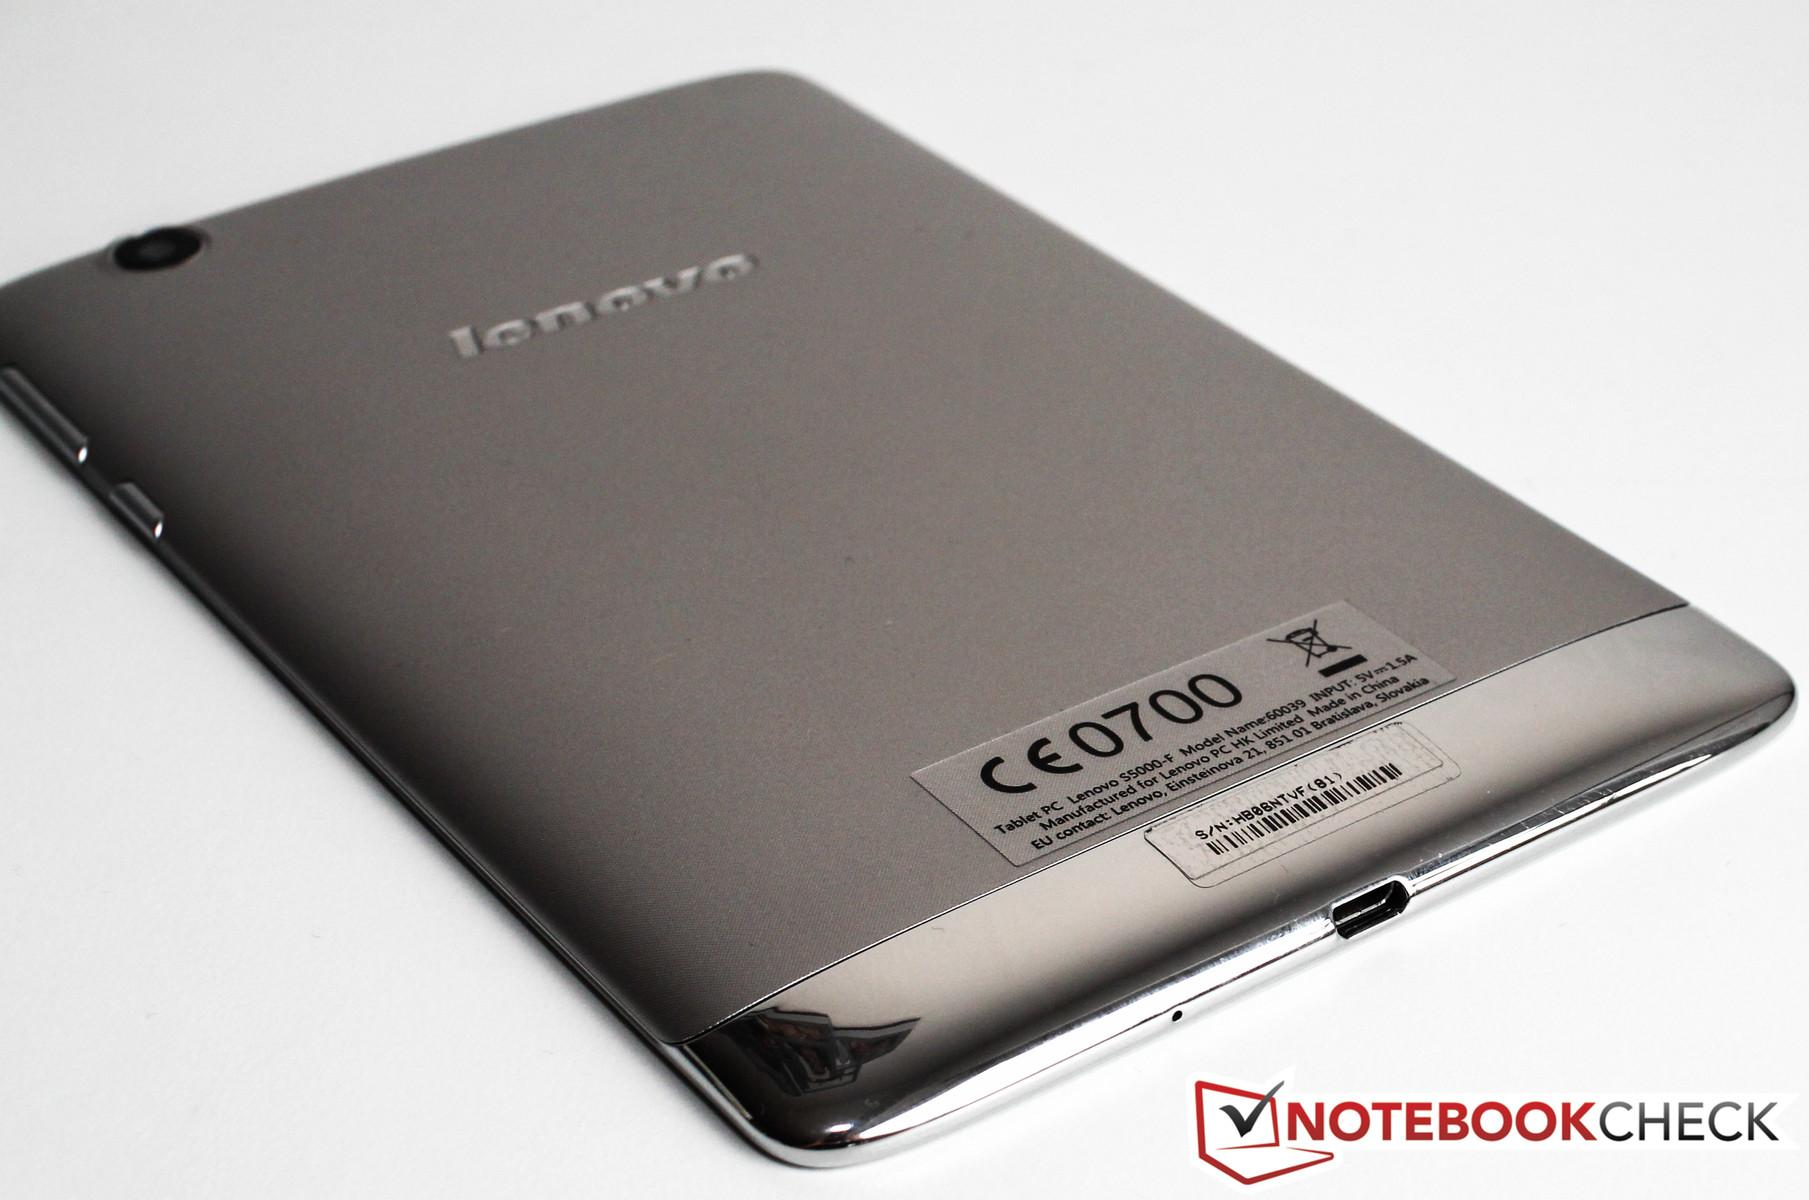 Review Lenovo S5000-F Tablet